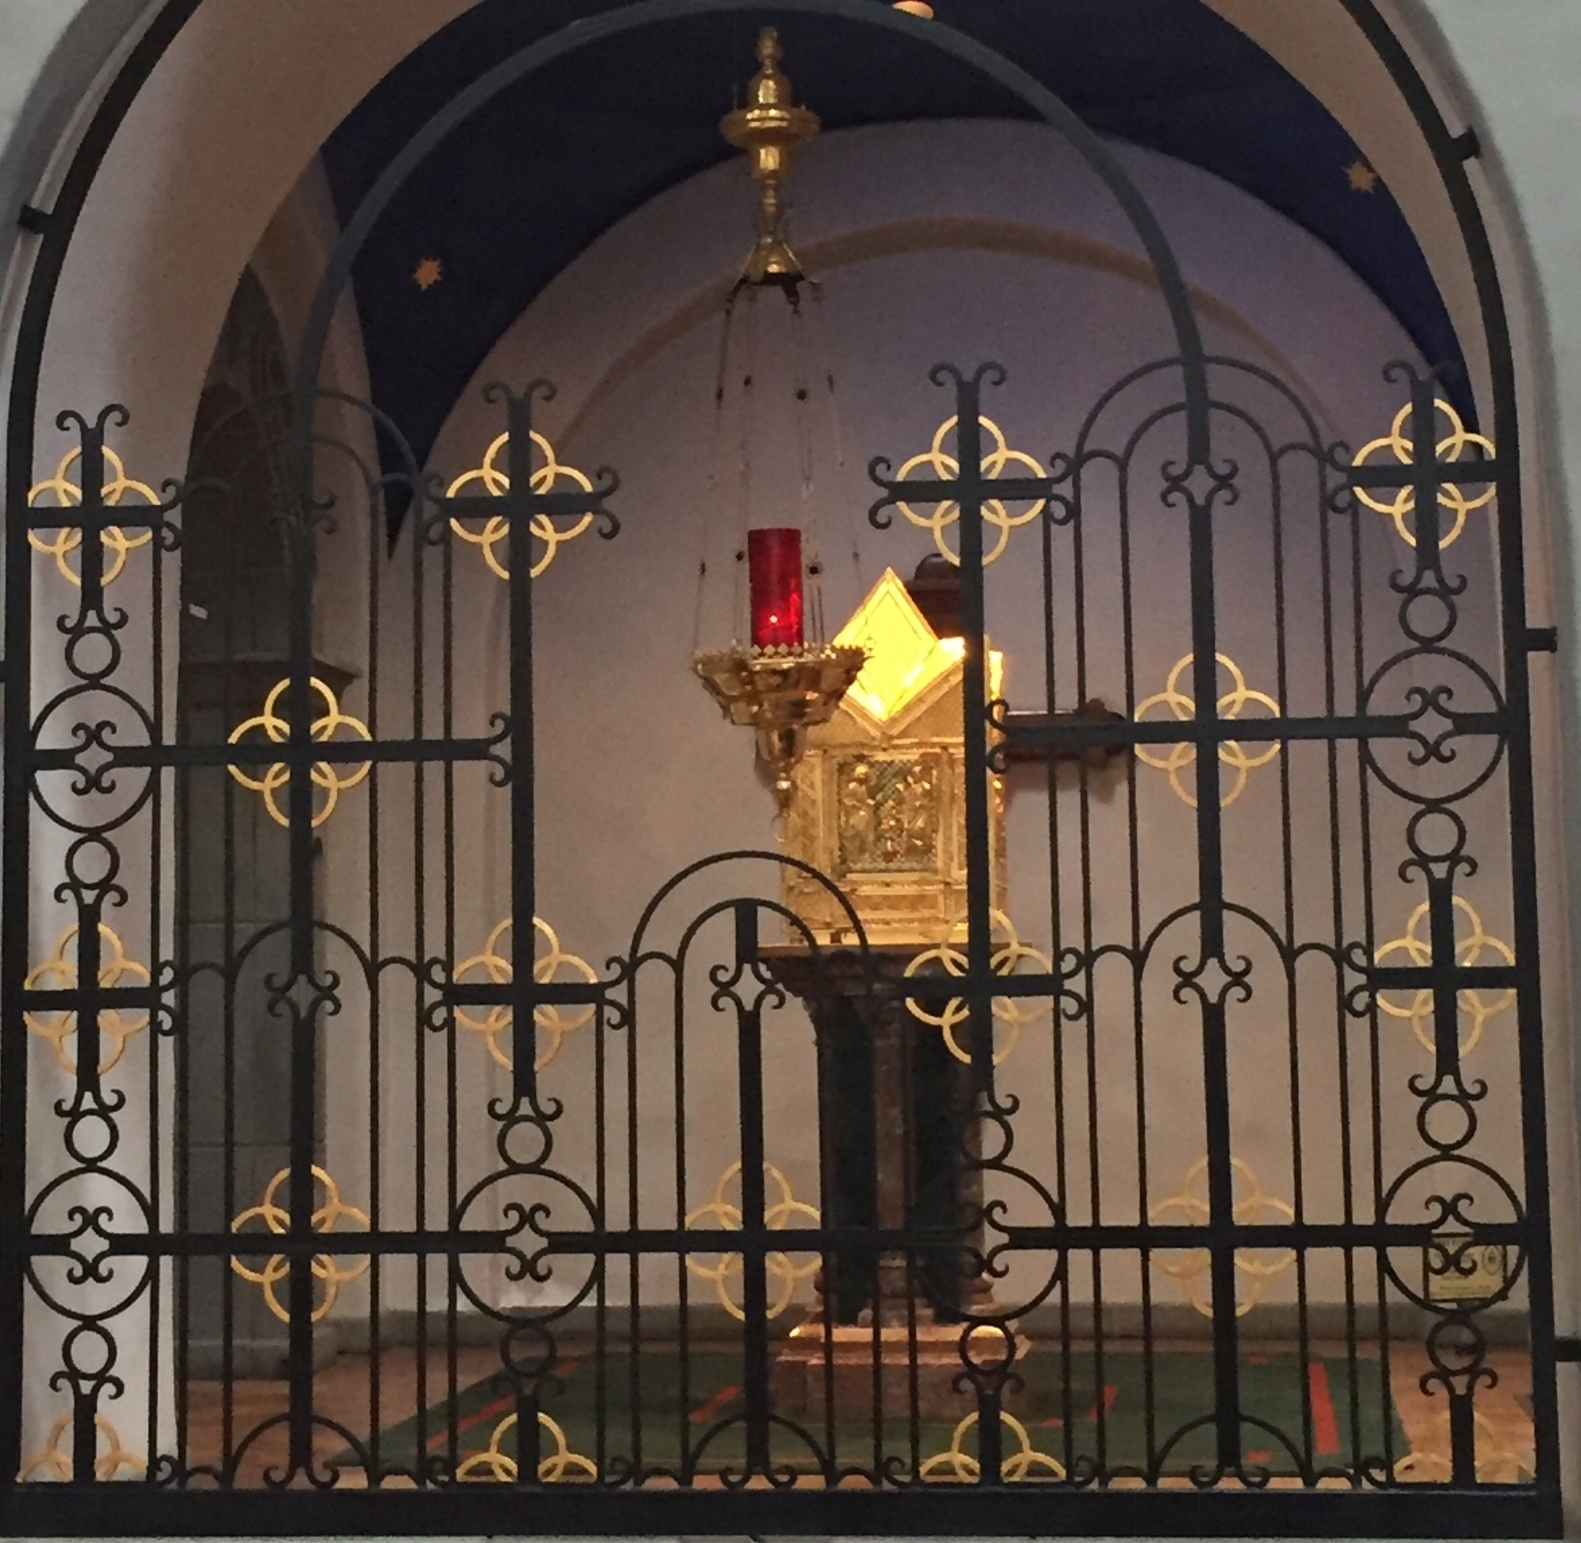 A Tabernacle